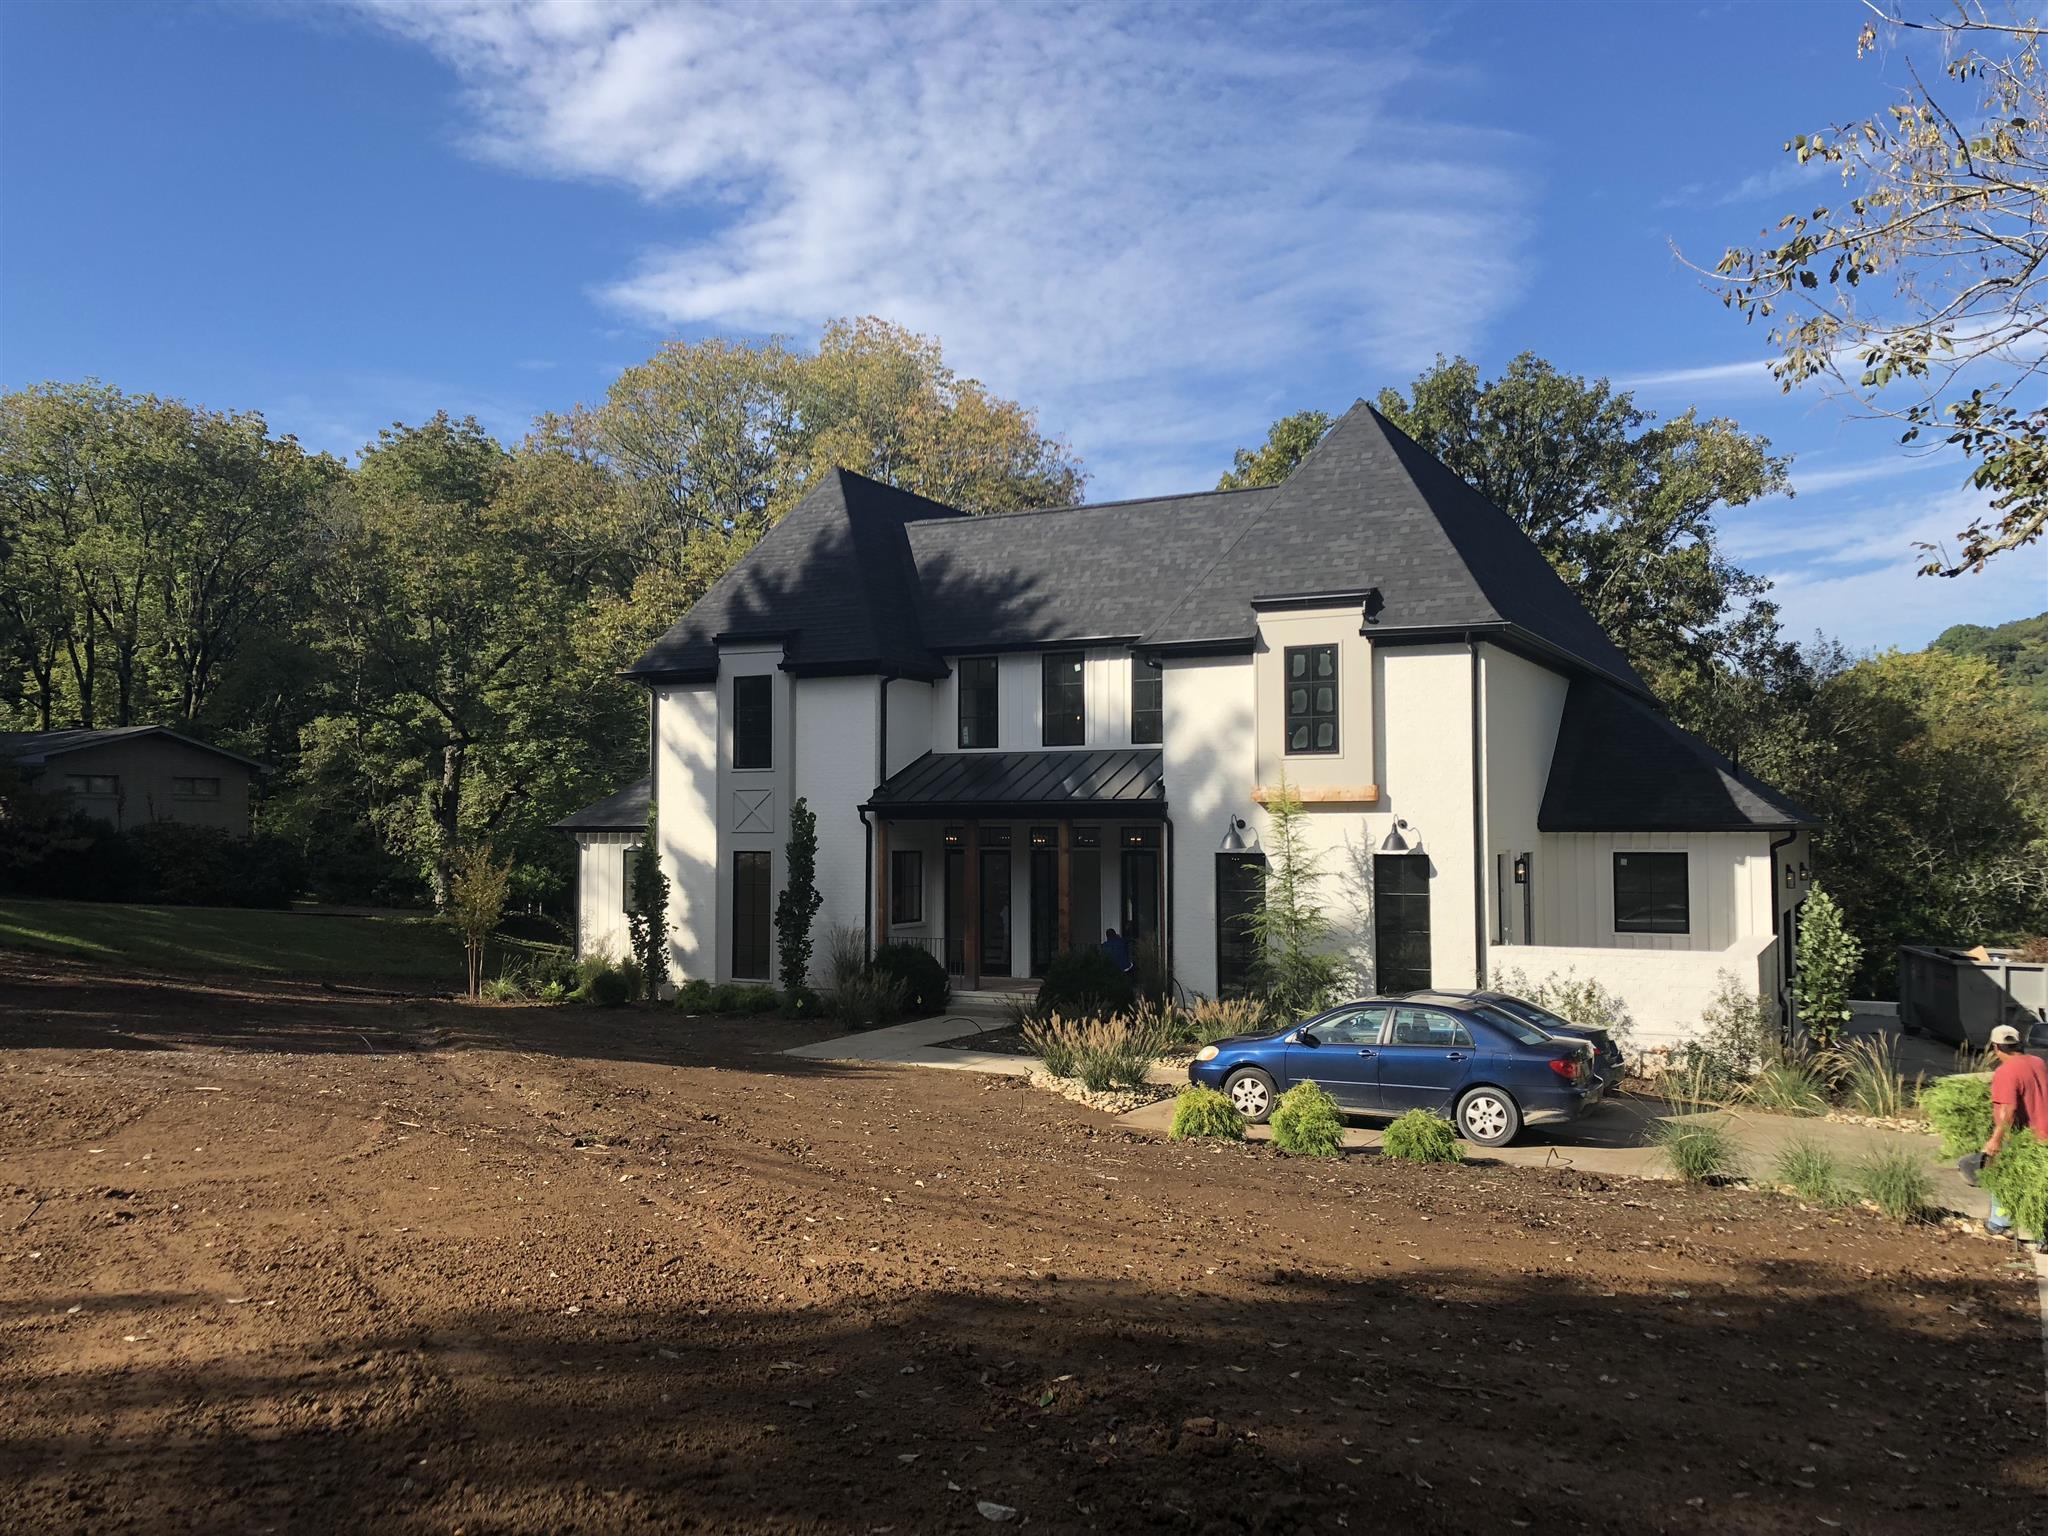 4613 Villa Green Dr, Nashville - Green Hills, Tennessee